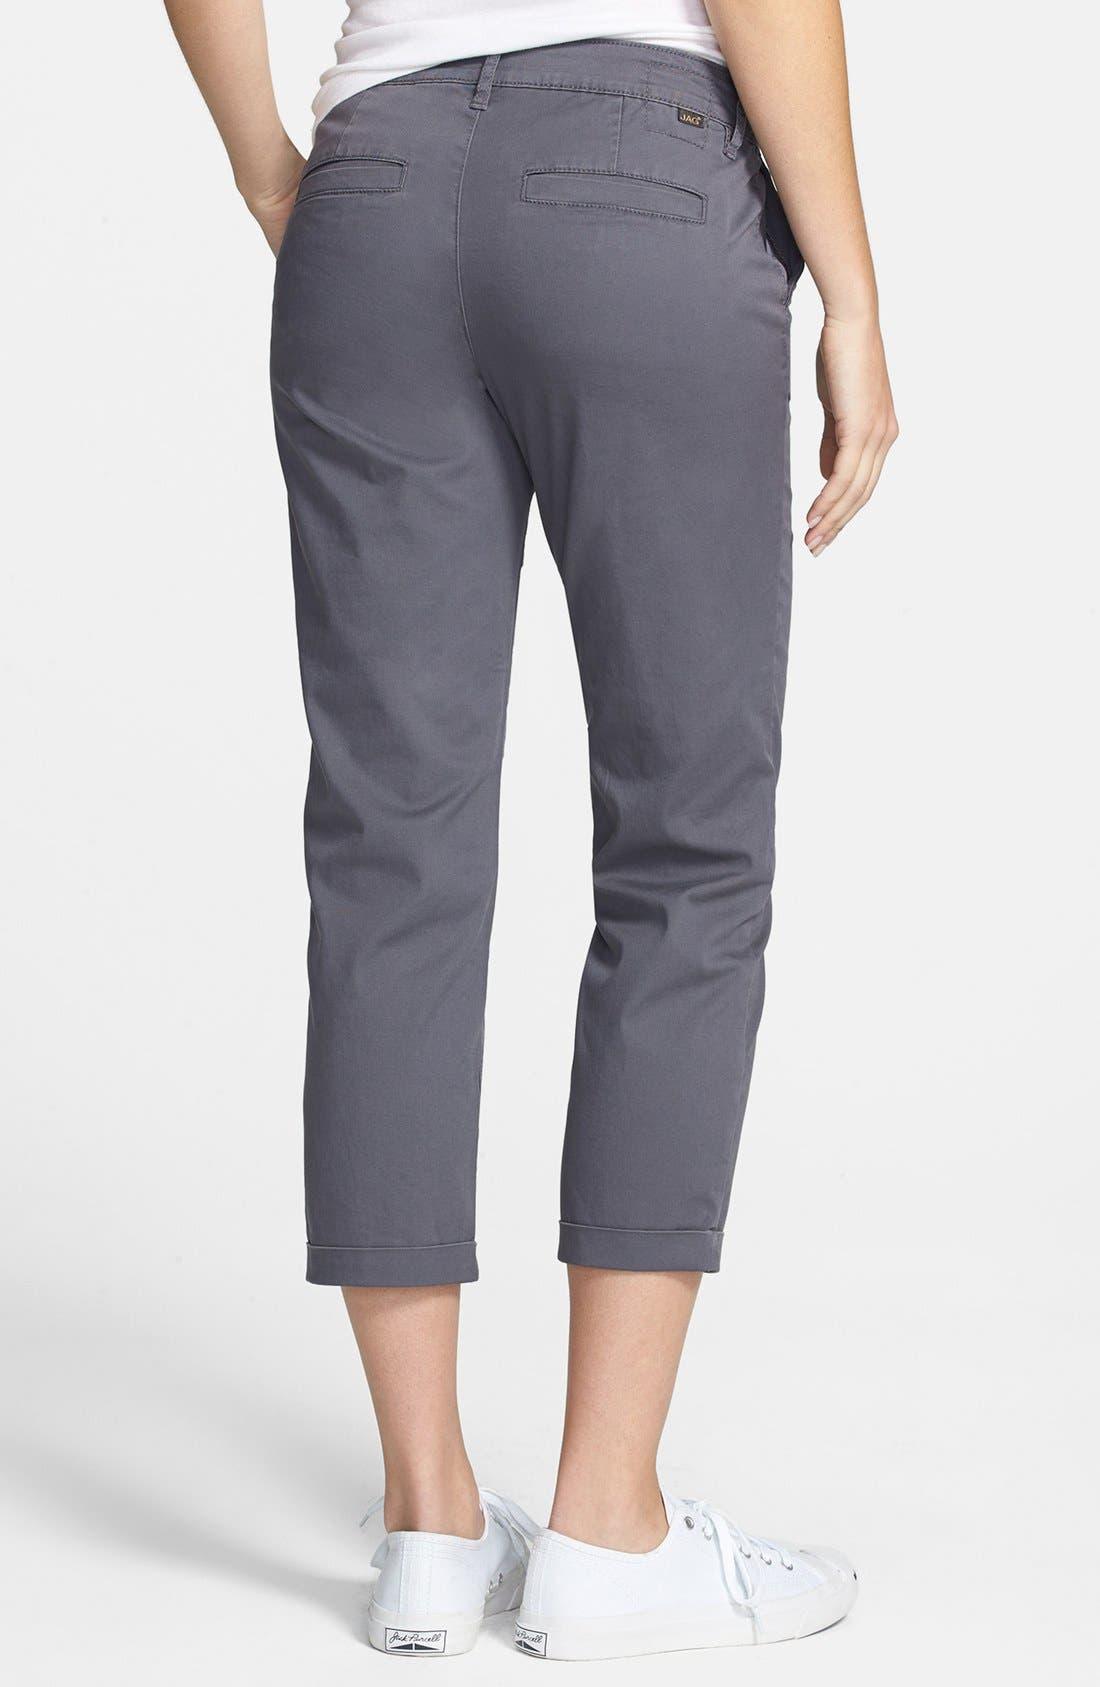 Alternate Image 2  - Jag Jeans 'Cora' Slim Crop Stretch Twill Pants (Regular & Petite)